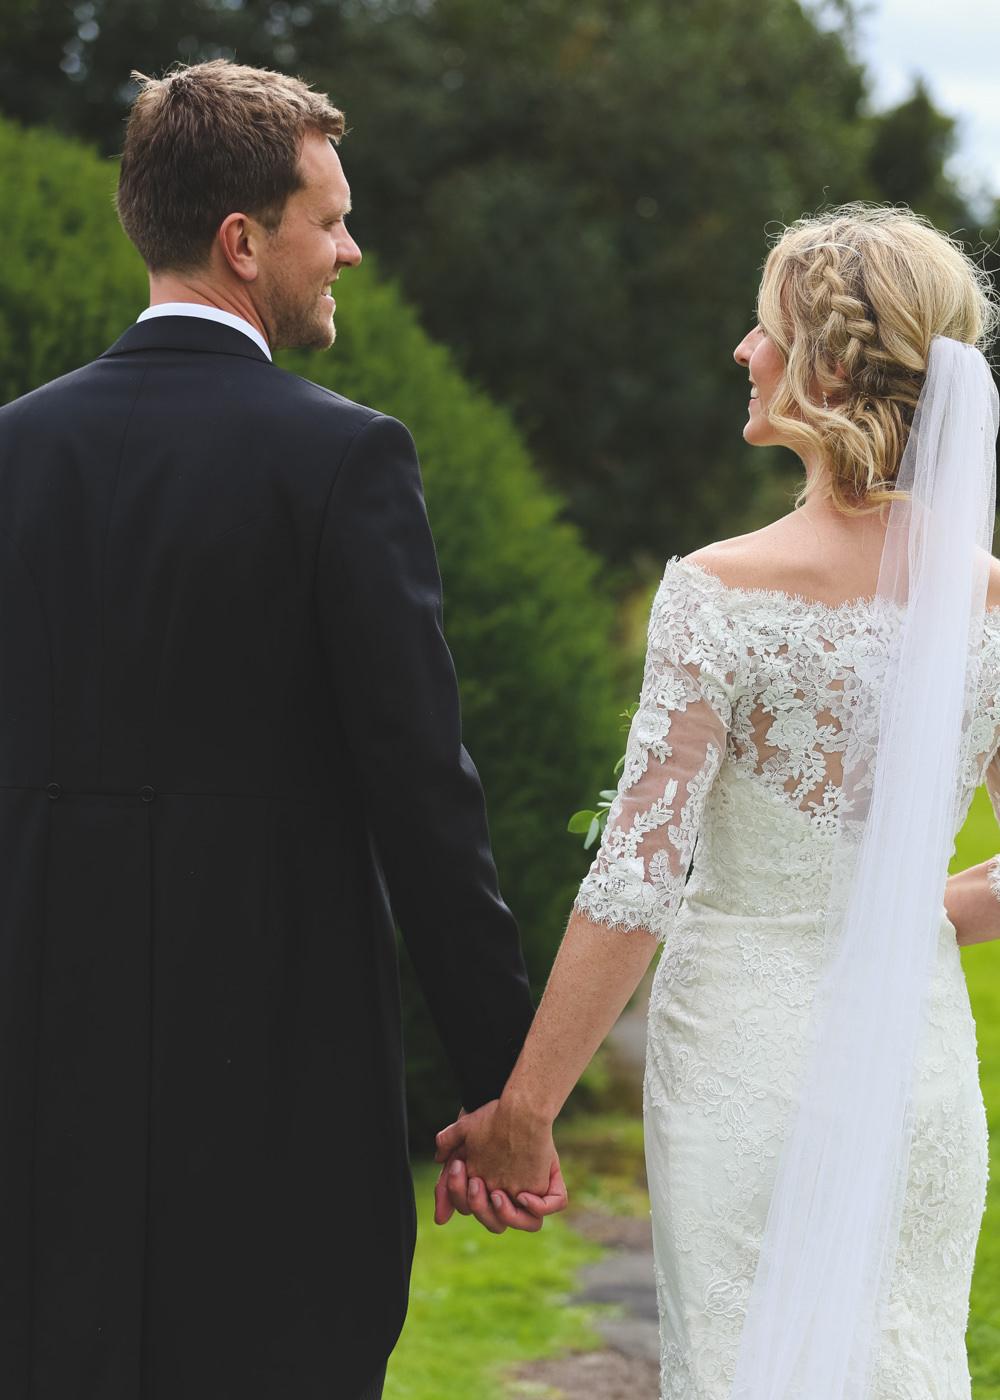 Bride Bridal Hair Style Up Do Plait Braid Veil Airbnb Wedding Pickavance Weddings